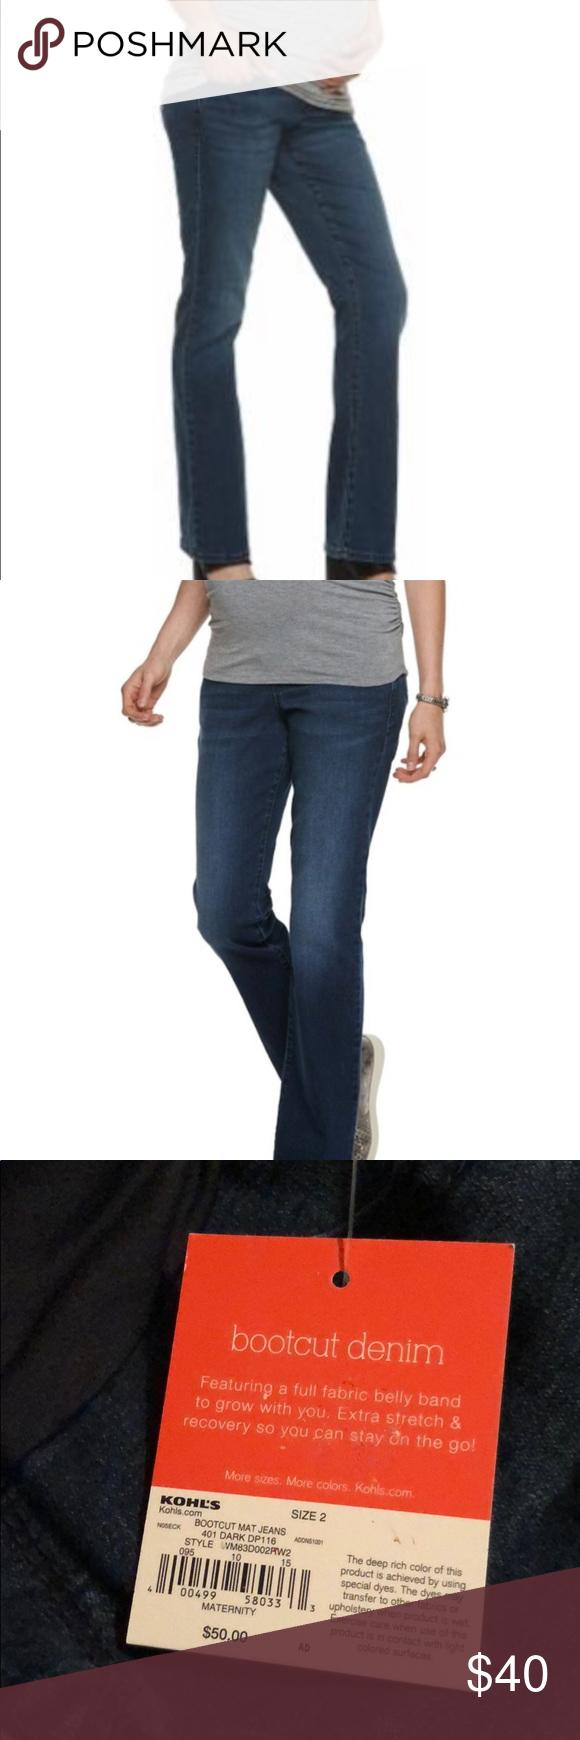 New A Glow Maternity Bootcut Dark Blue Jeans Denim In 2020 Dark Blue Jeans Bootcut Blue Jeans